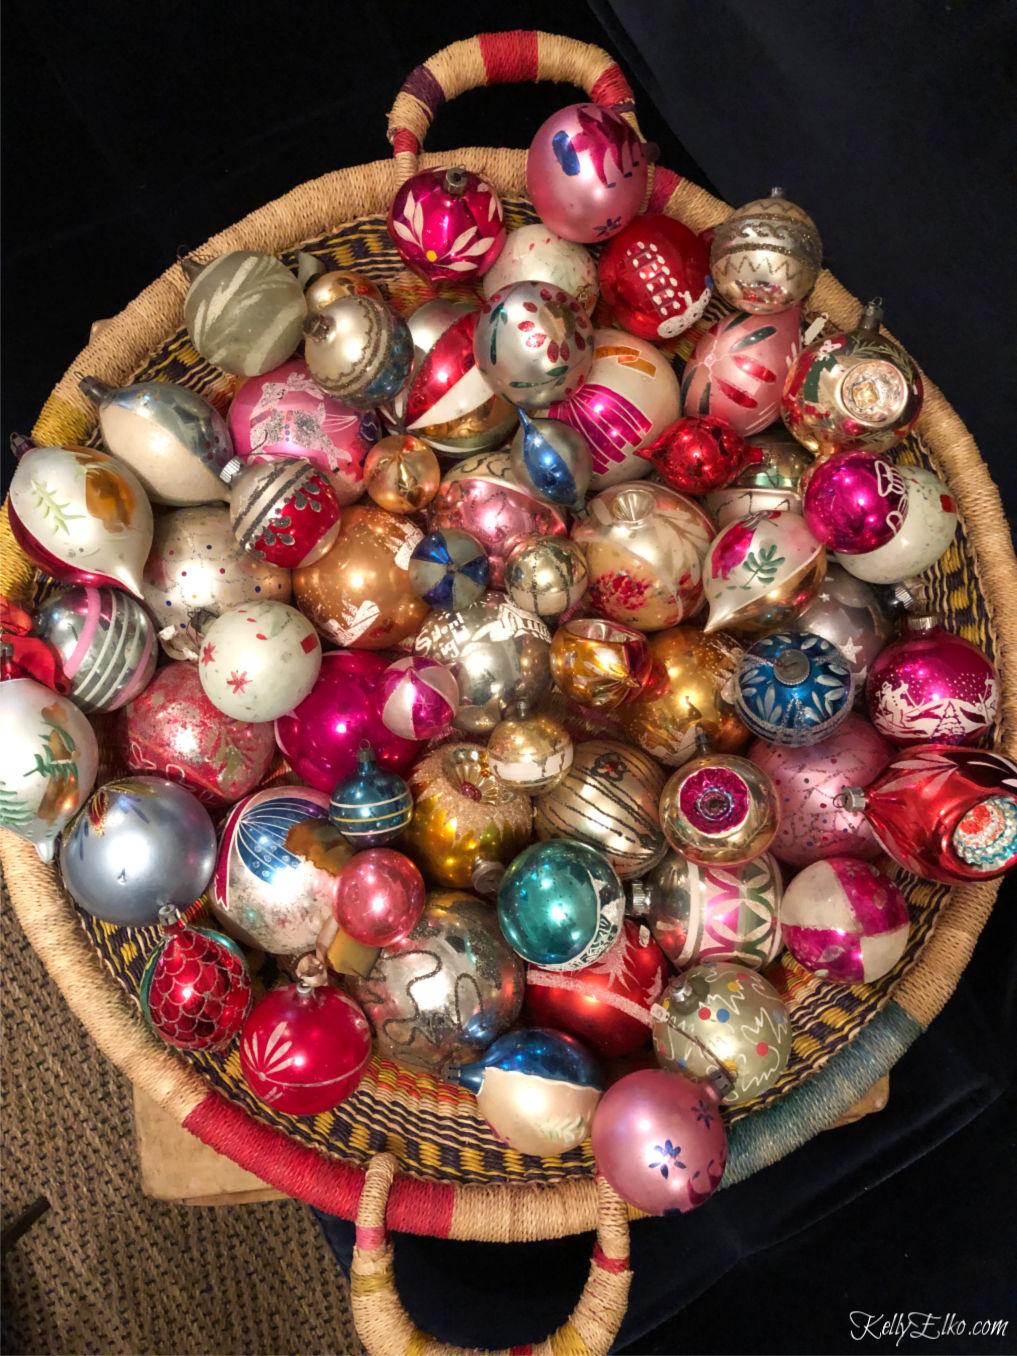 Huge vintage collection of Shiny Brite Christmas ornaments kellyelko.com #shinybrite #vintageornaments #vintagechristmas #vintagecollection #christmasornaments #christmasdecor